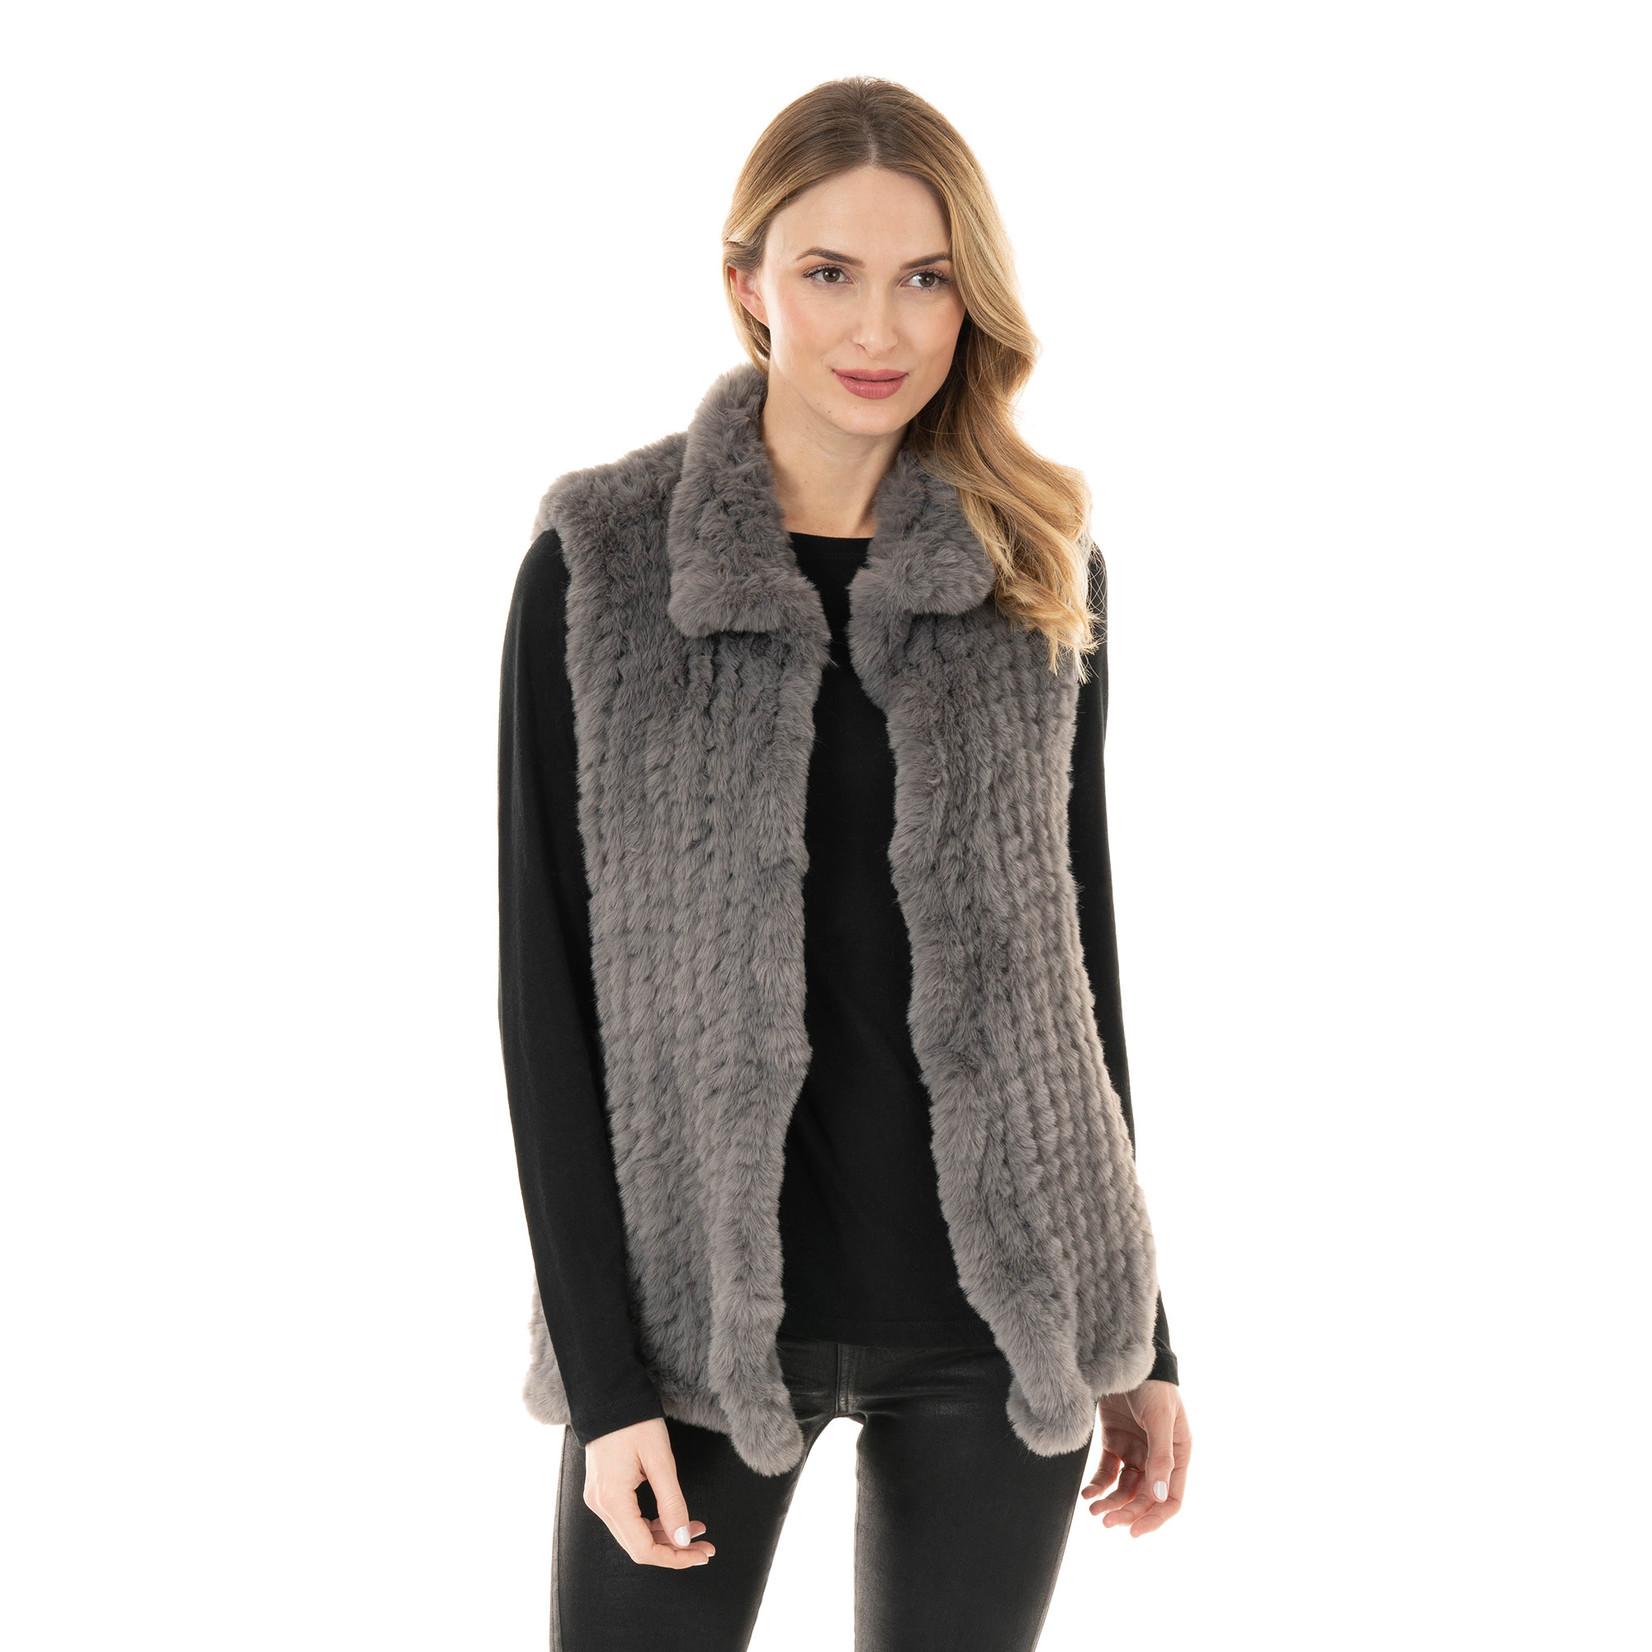 Fabulous Furs Faux Fur & Knit Vest Slate Gray Med